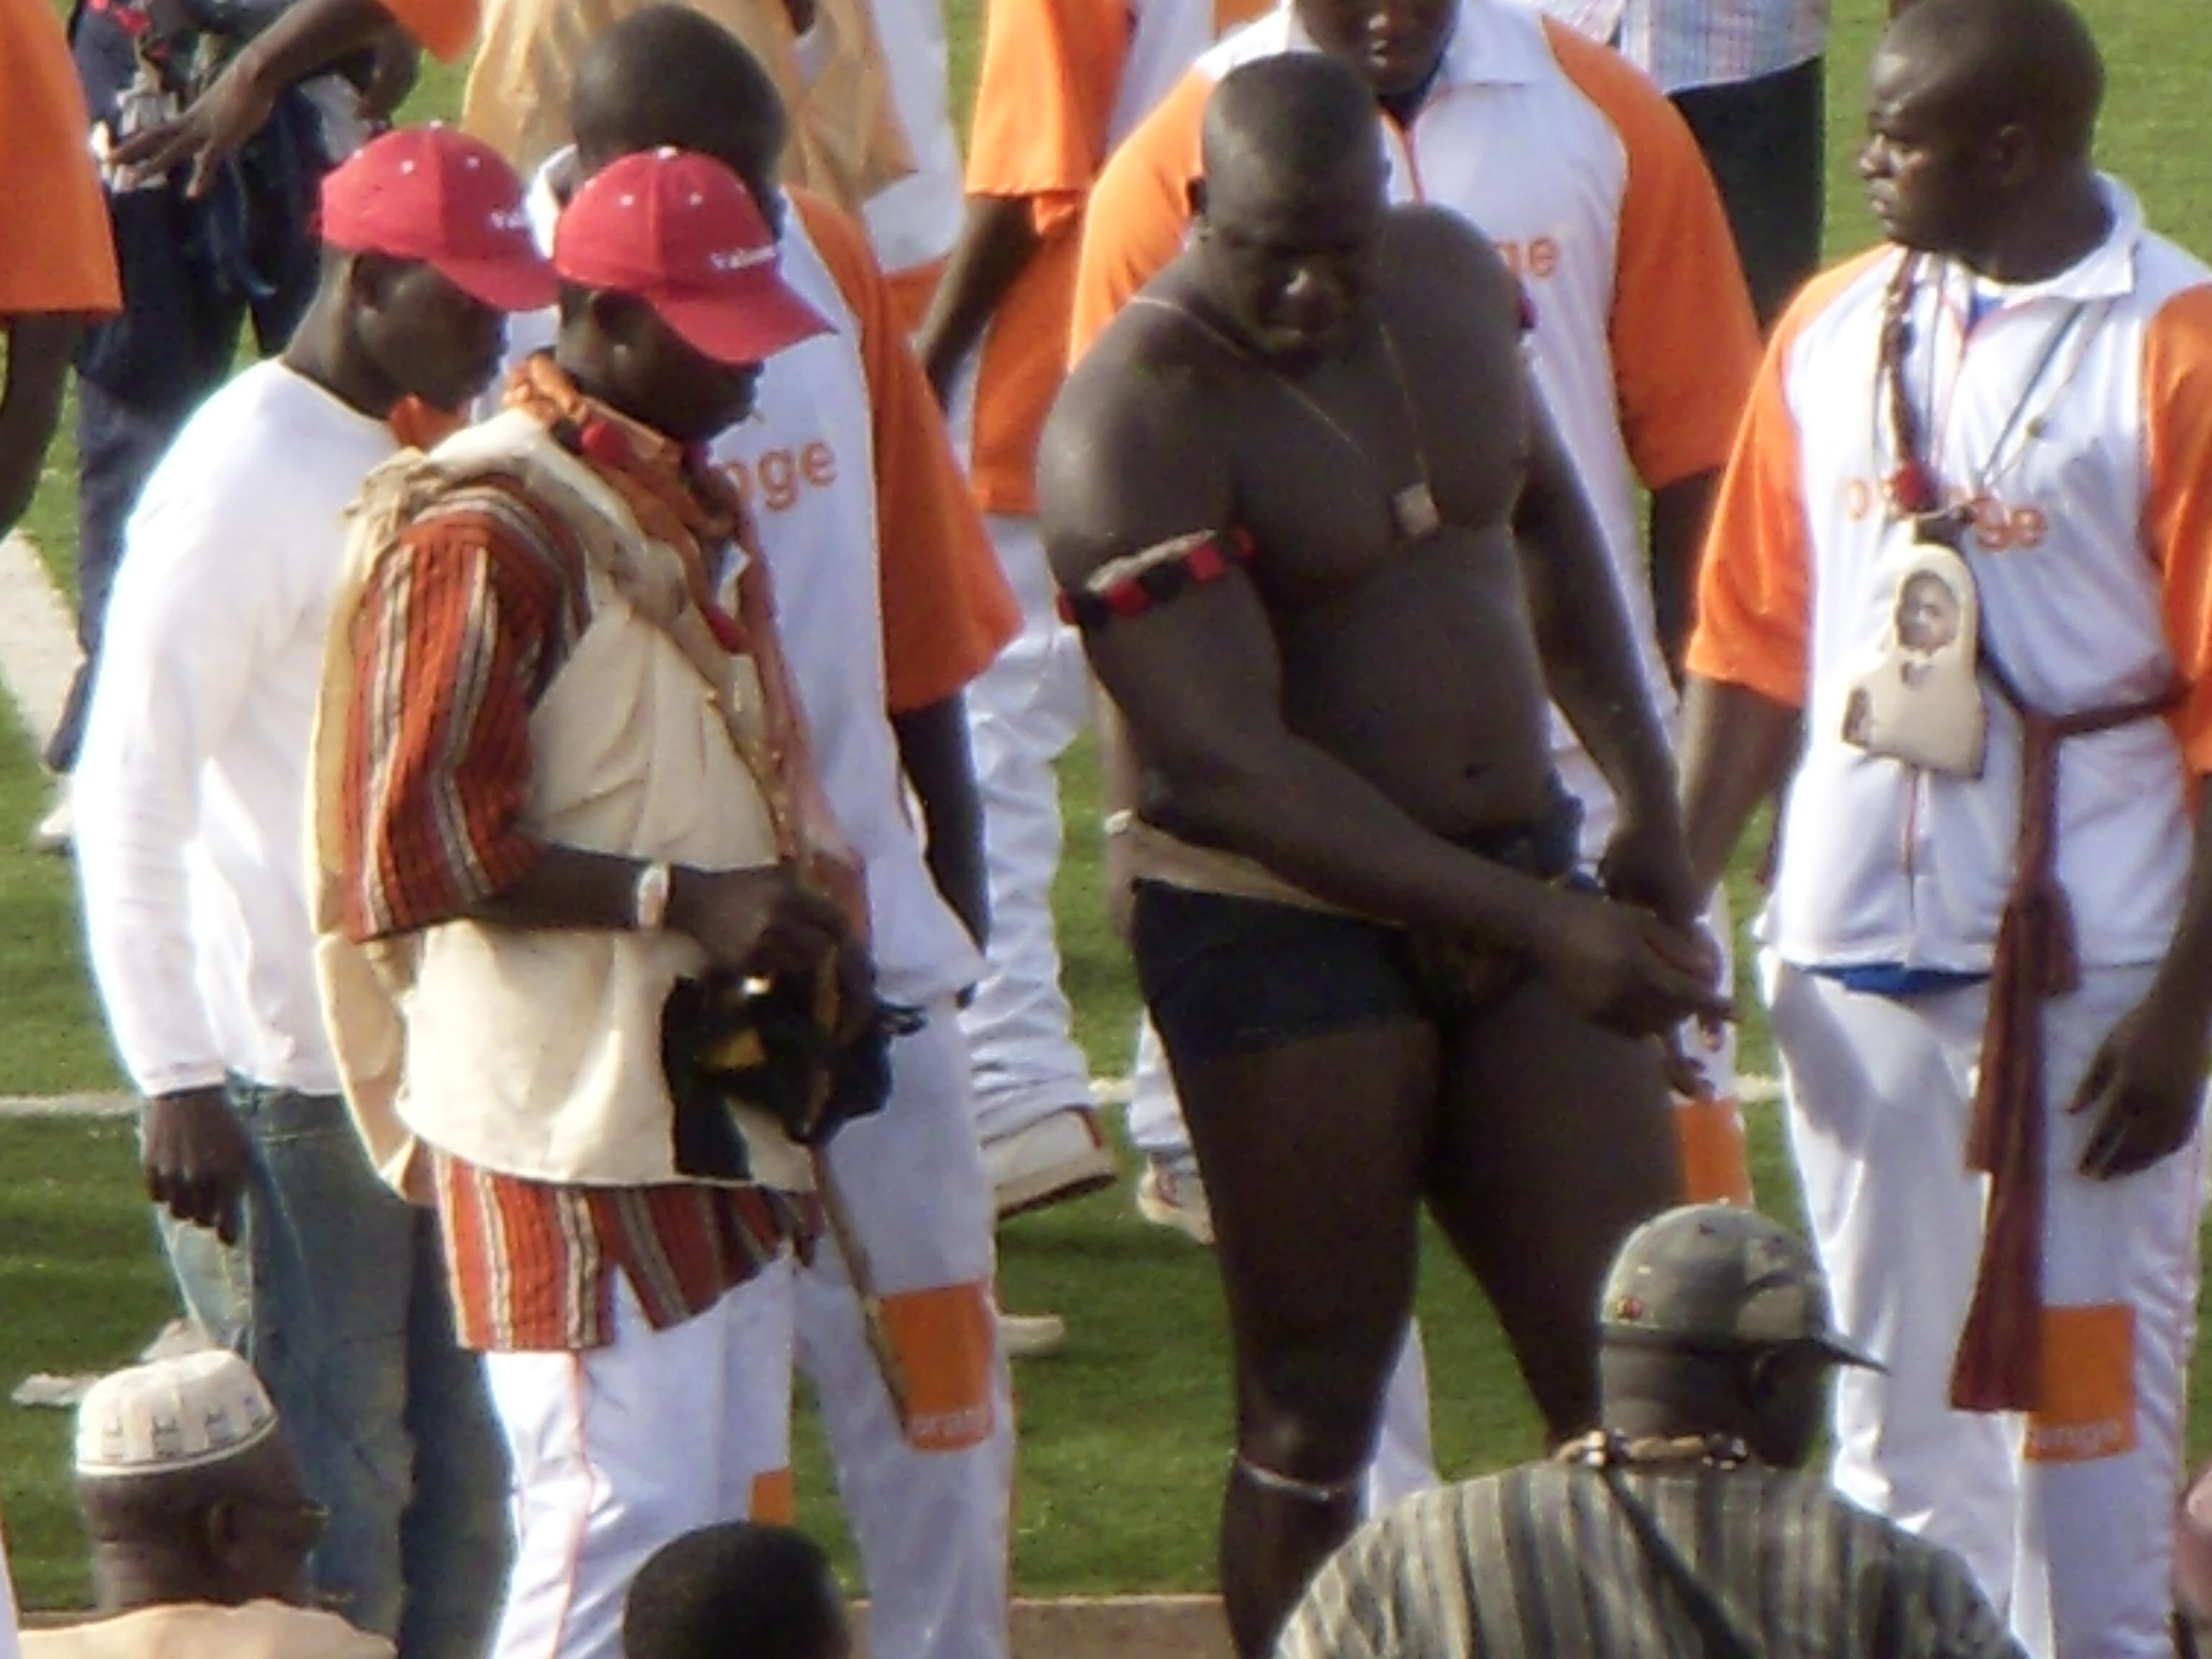 Champion wrestler Yékini (Yakhya Diop) at the Stade Demba Diop in Dakar, Senegal. Photo taken on June 10, 2006.